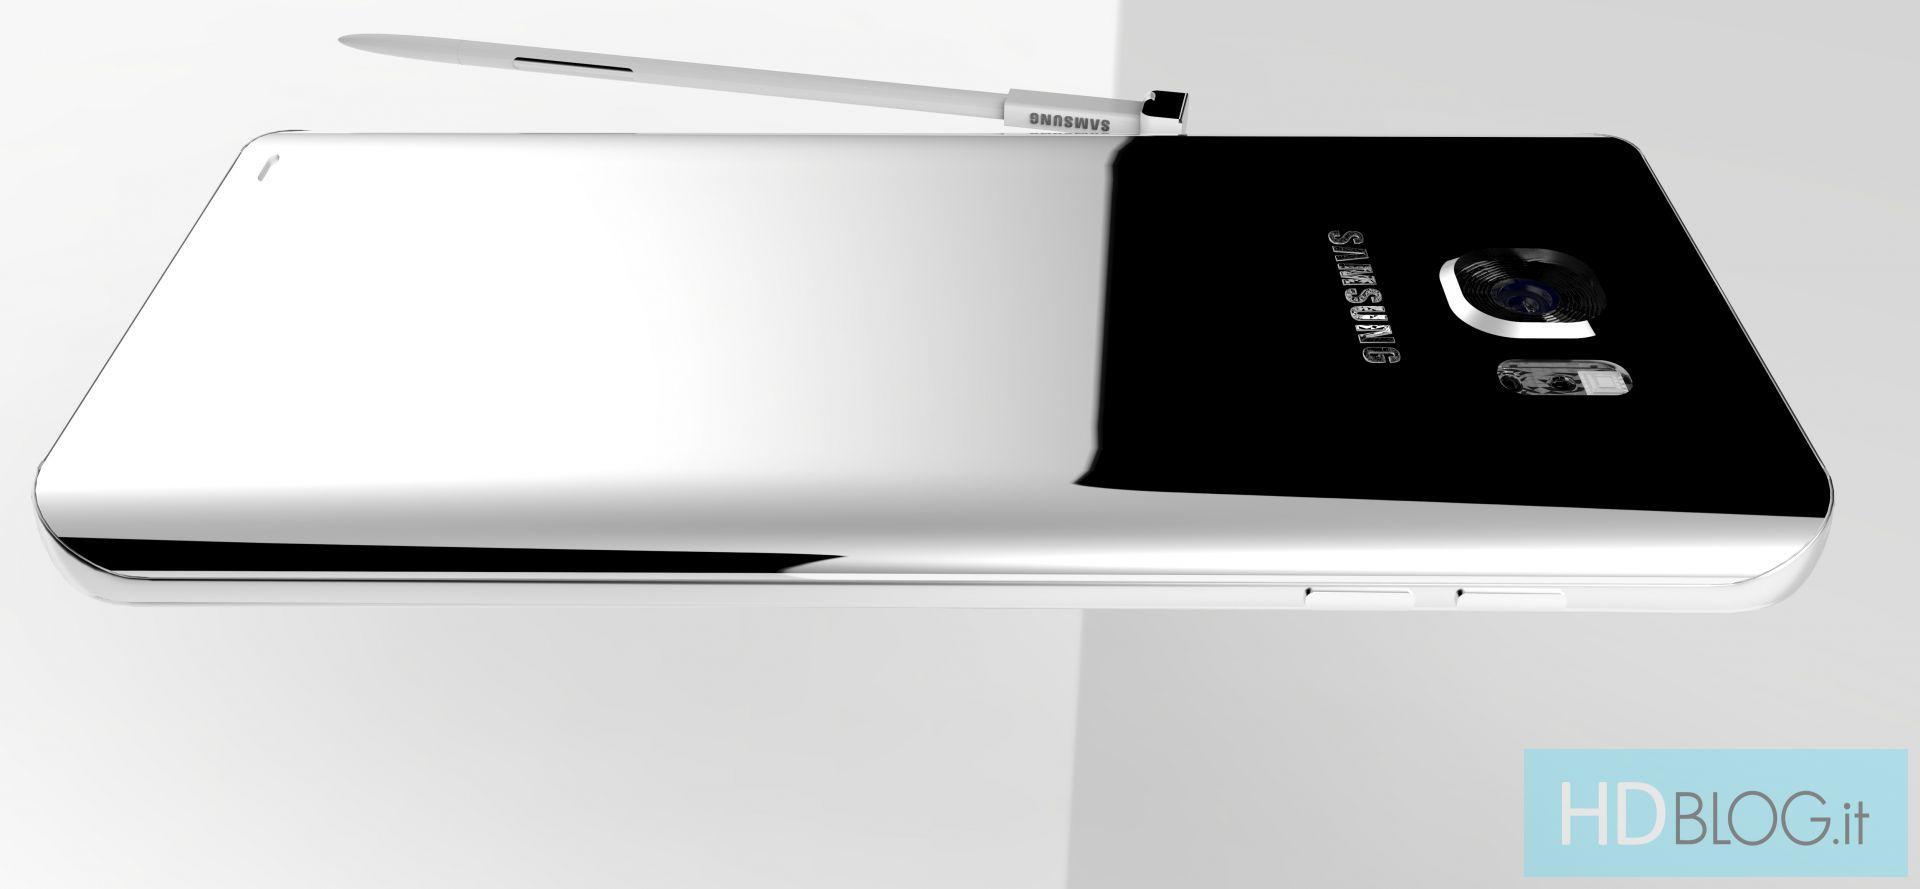 Galaxy-Note-5-schematics-and-concept-renders-21.jpg